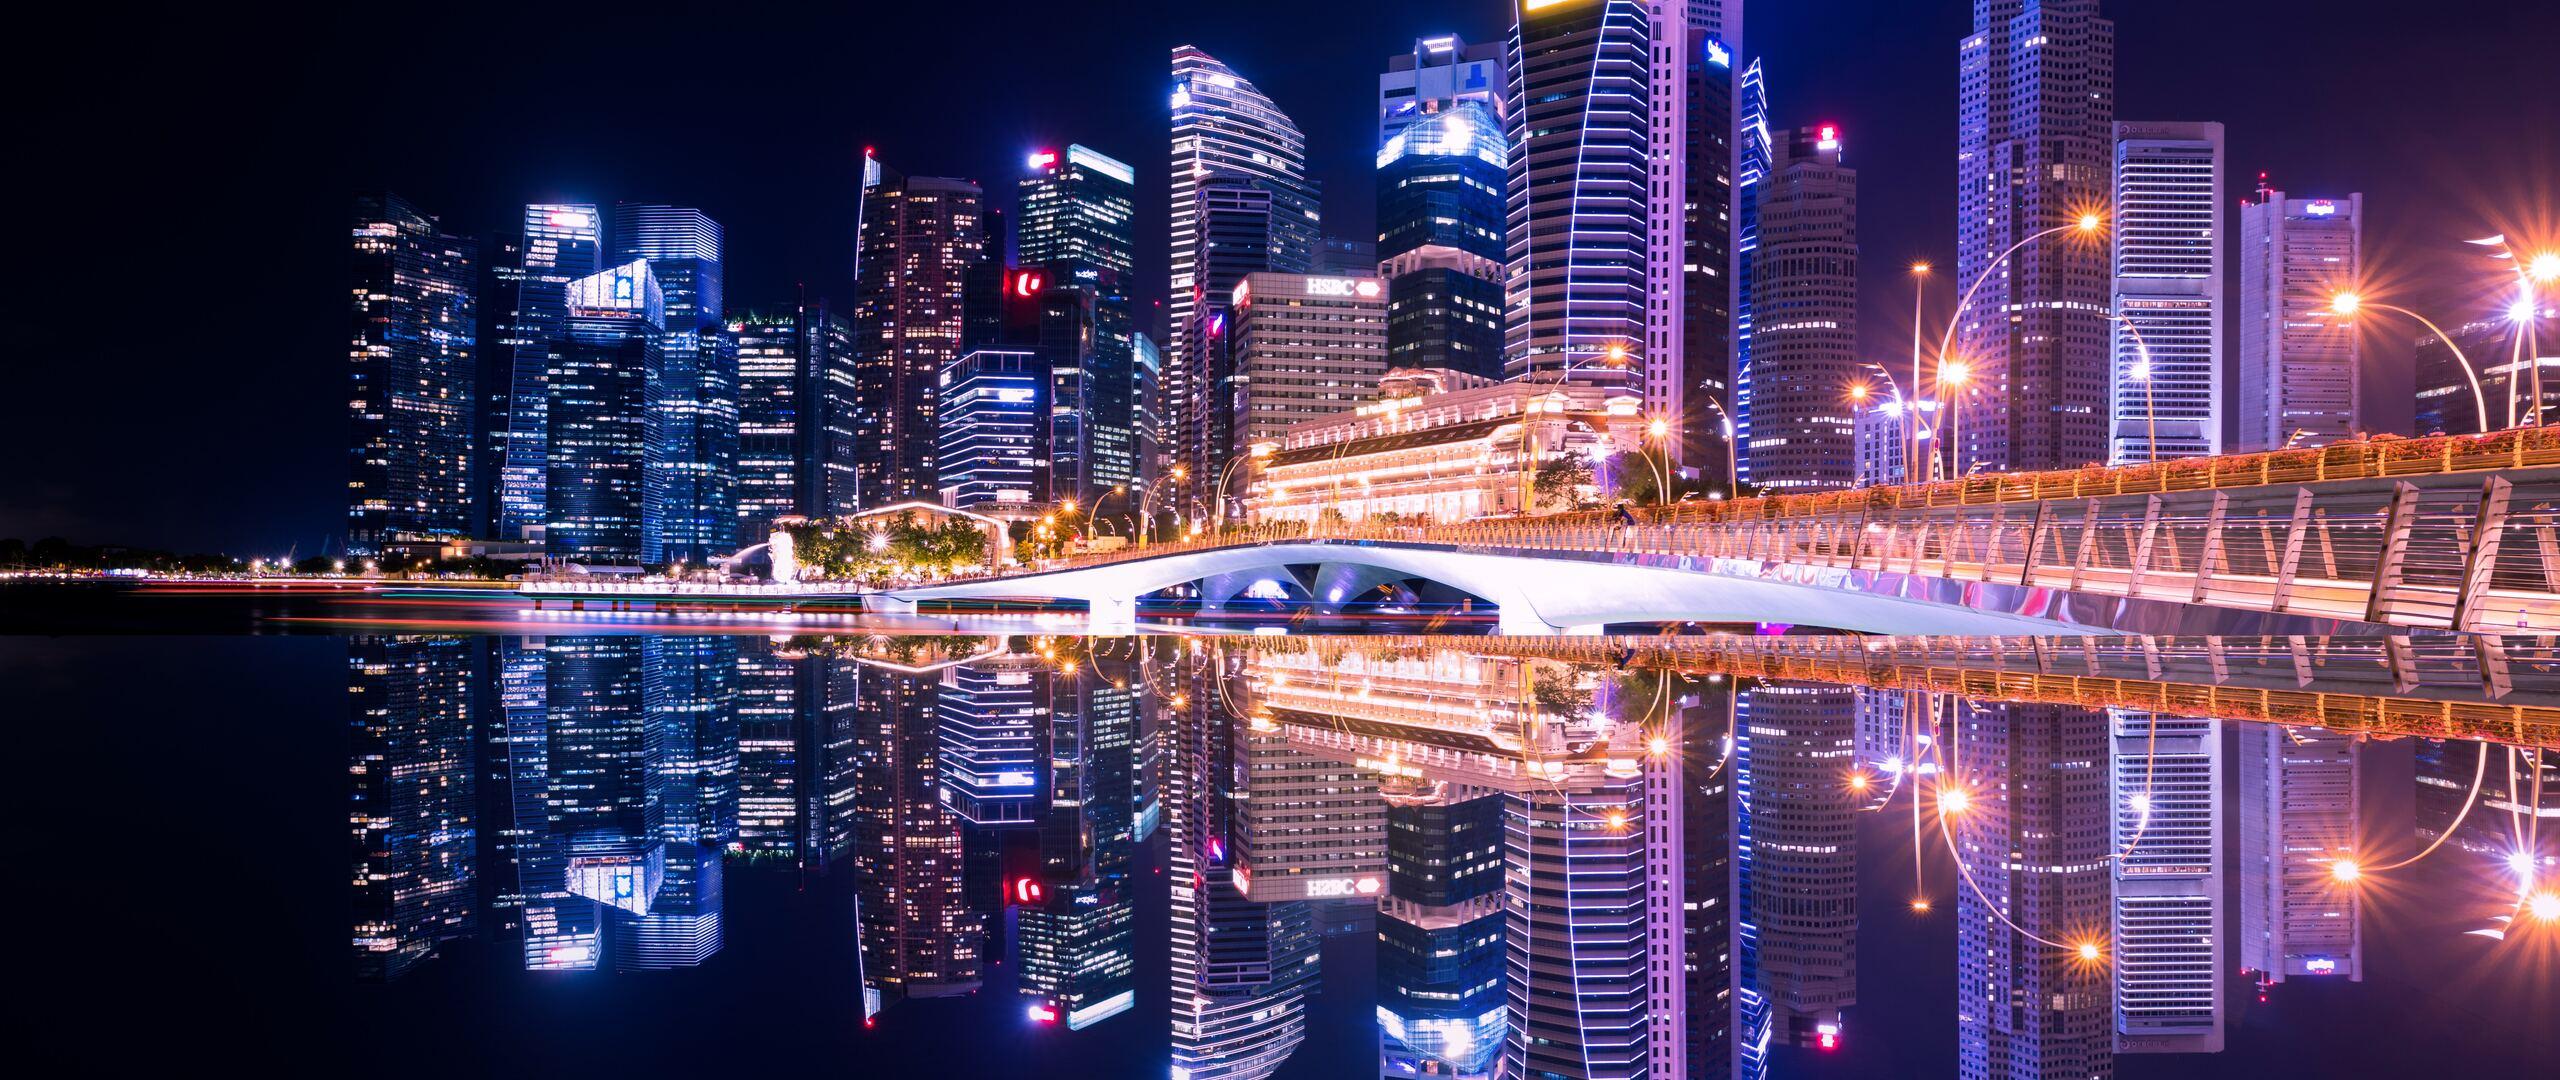 singapore-city-skyline-5k-kb.jpg